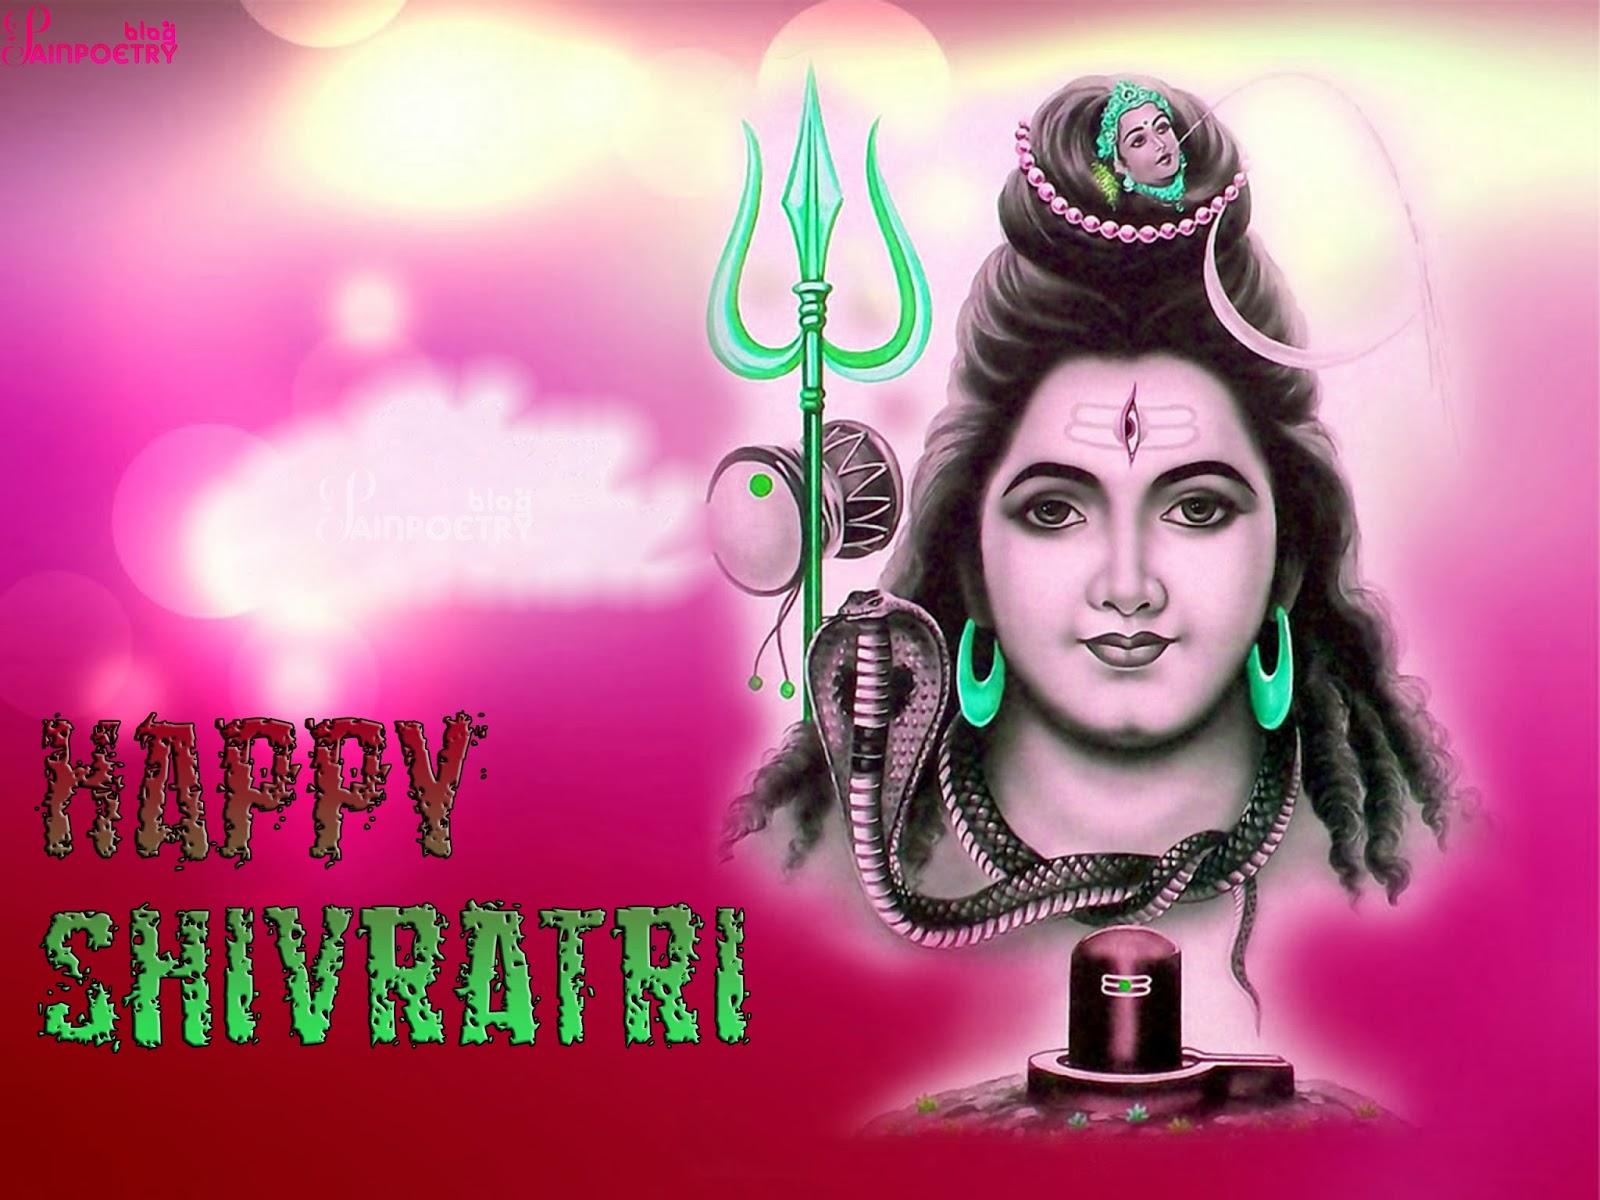 Happy-Shivratri-Wishes-Wallpaper-Image-Photo-Wallpaper-HD-Wide